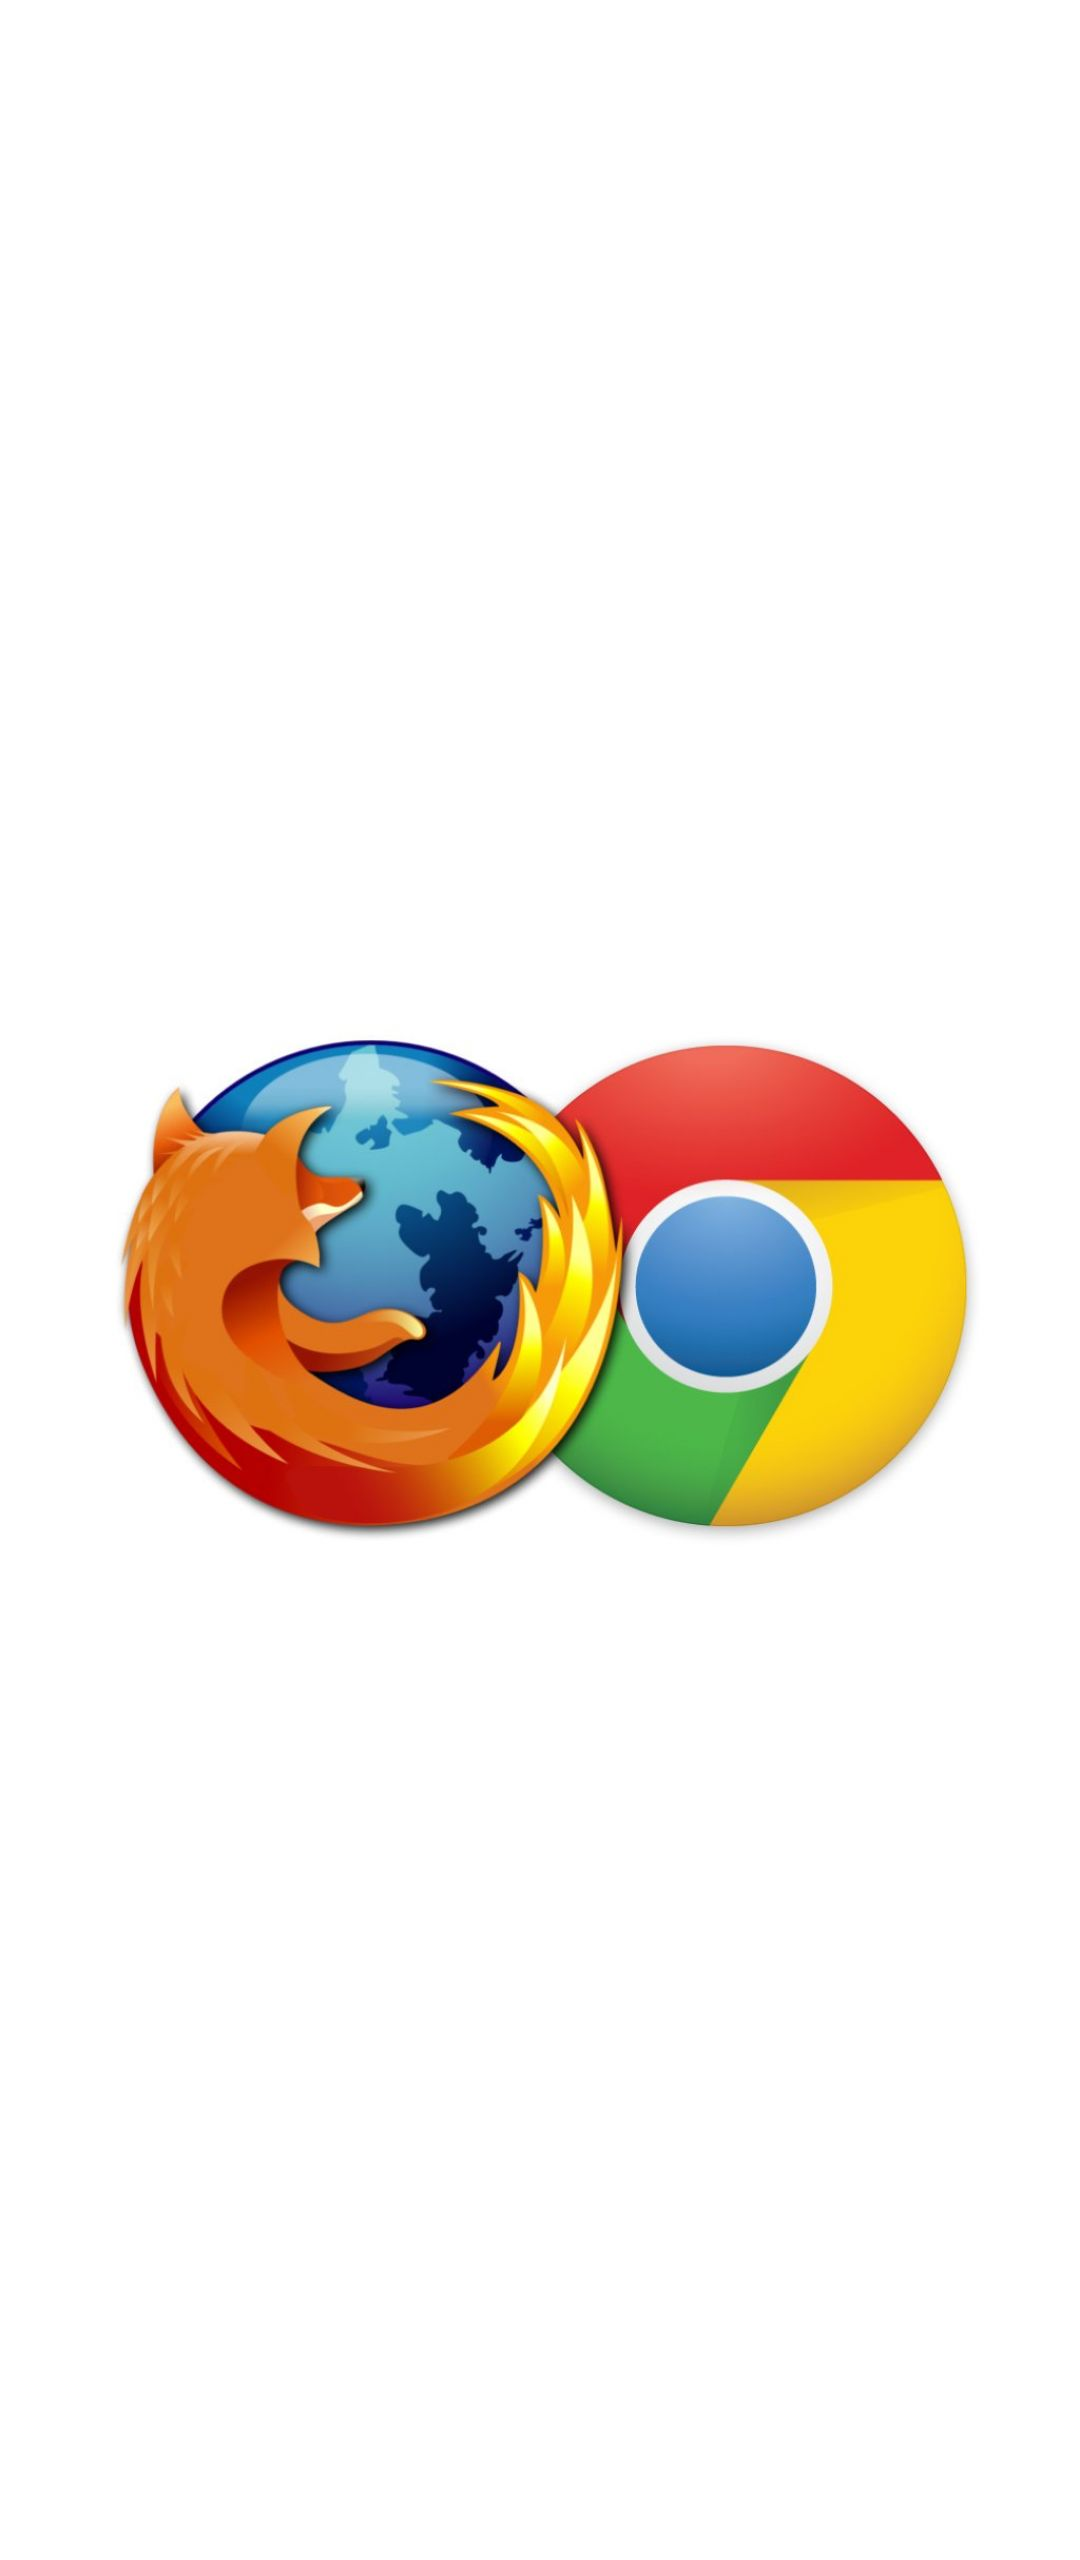 Chao Yahoo! Firefox regresa con Google